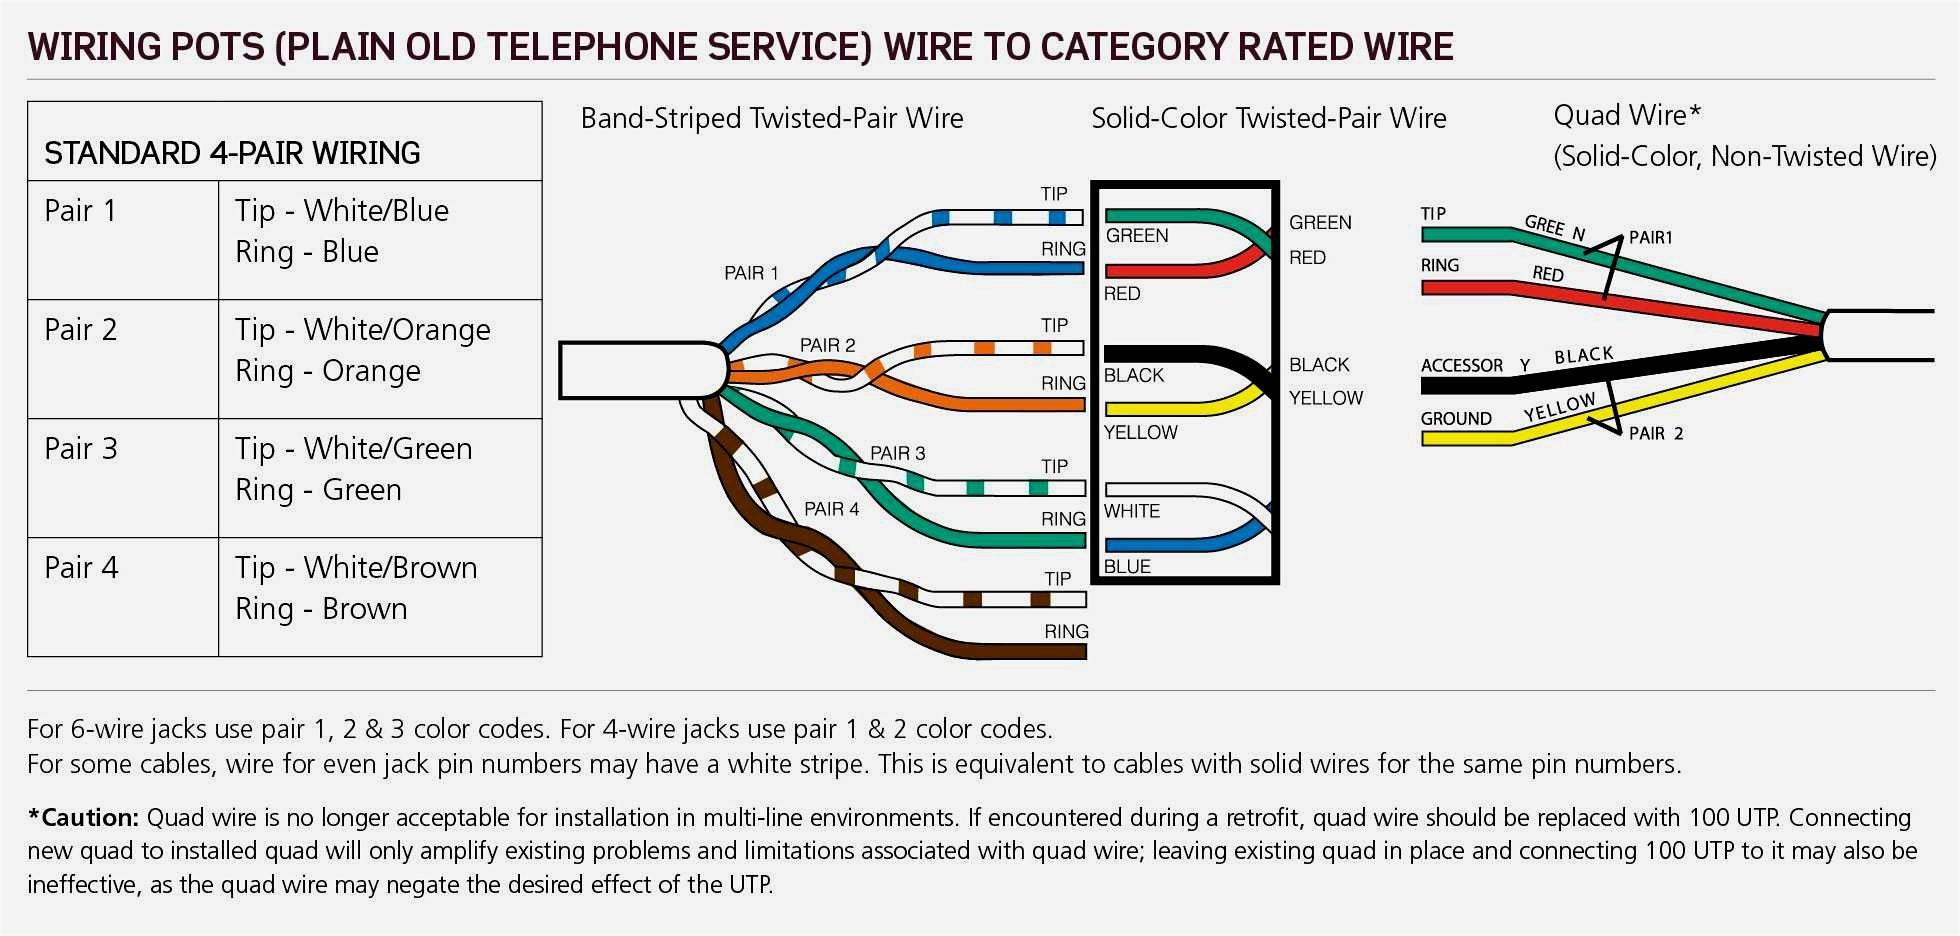 rj11 wiring diagram using cat5e wiring diagram cat3 wiring diagram cat5e color wiring diagram #8